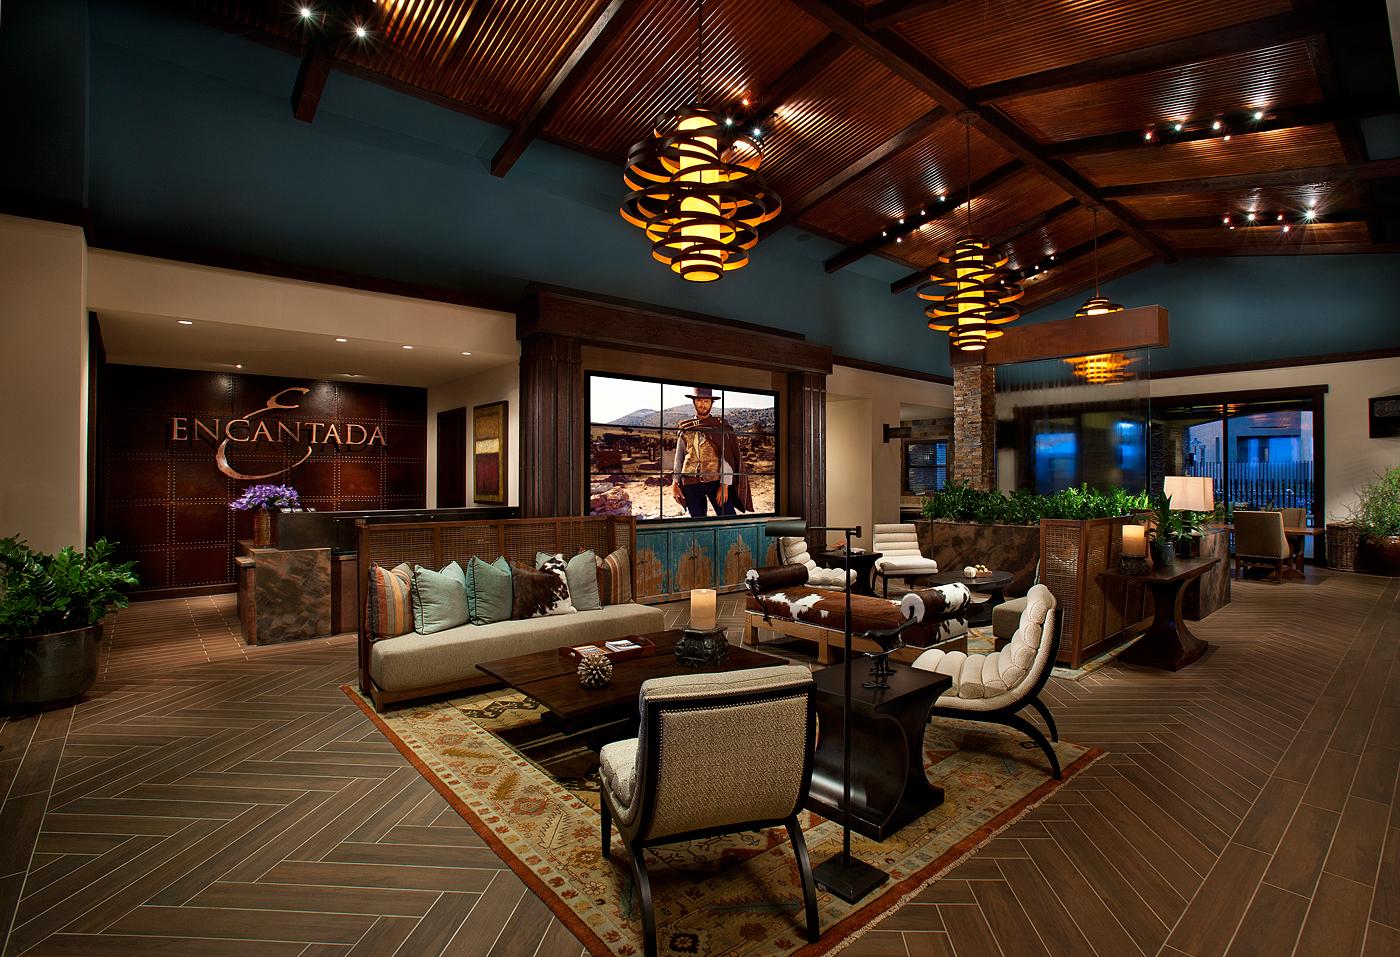 Classy lobby showcasing a video wall